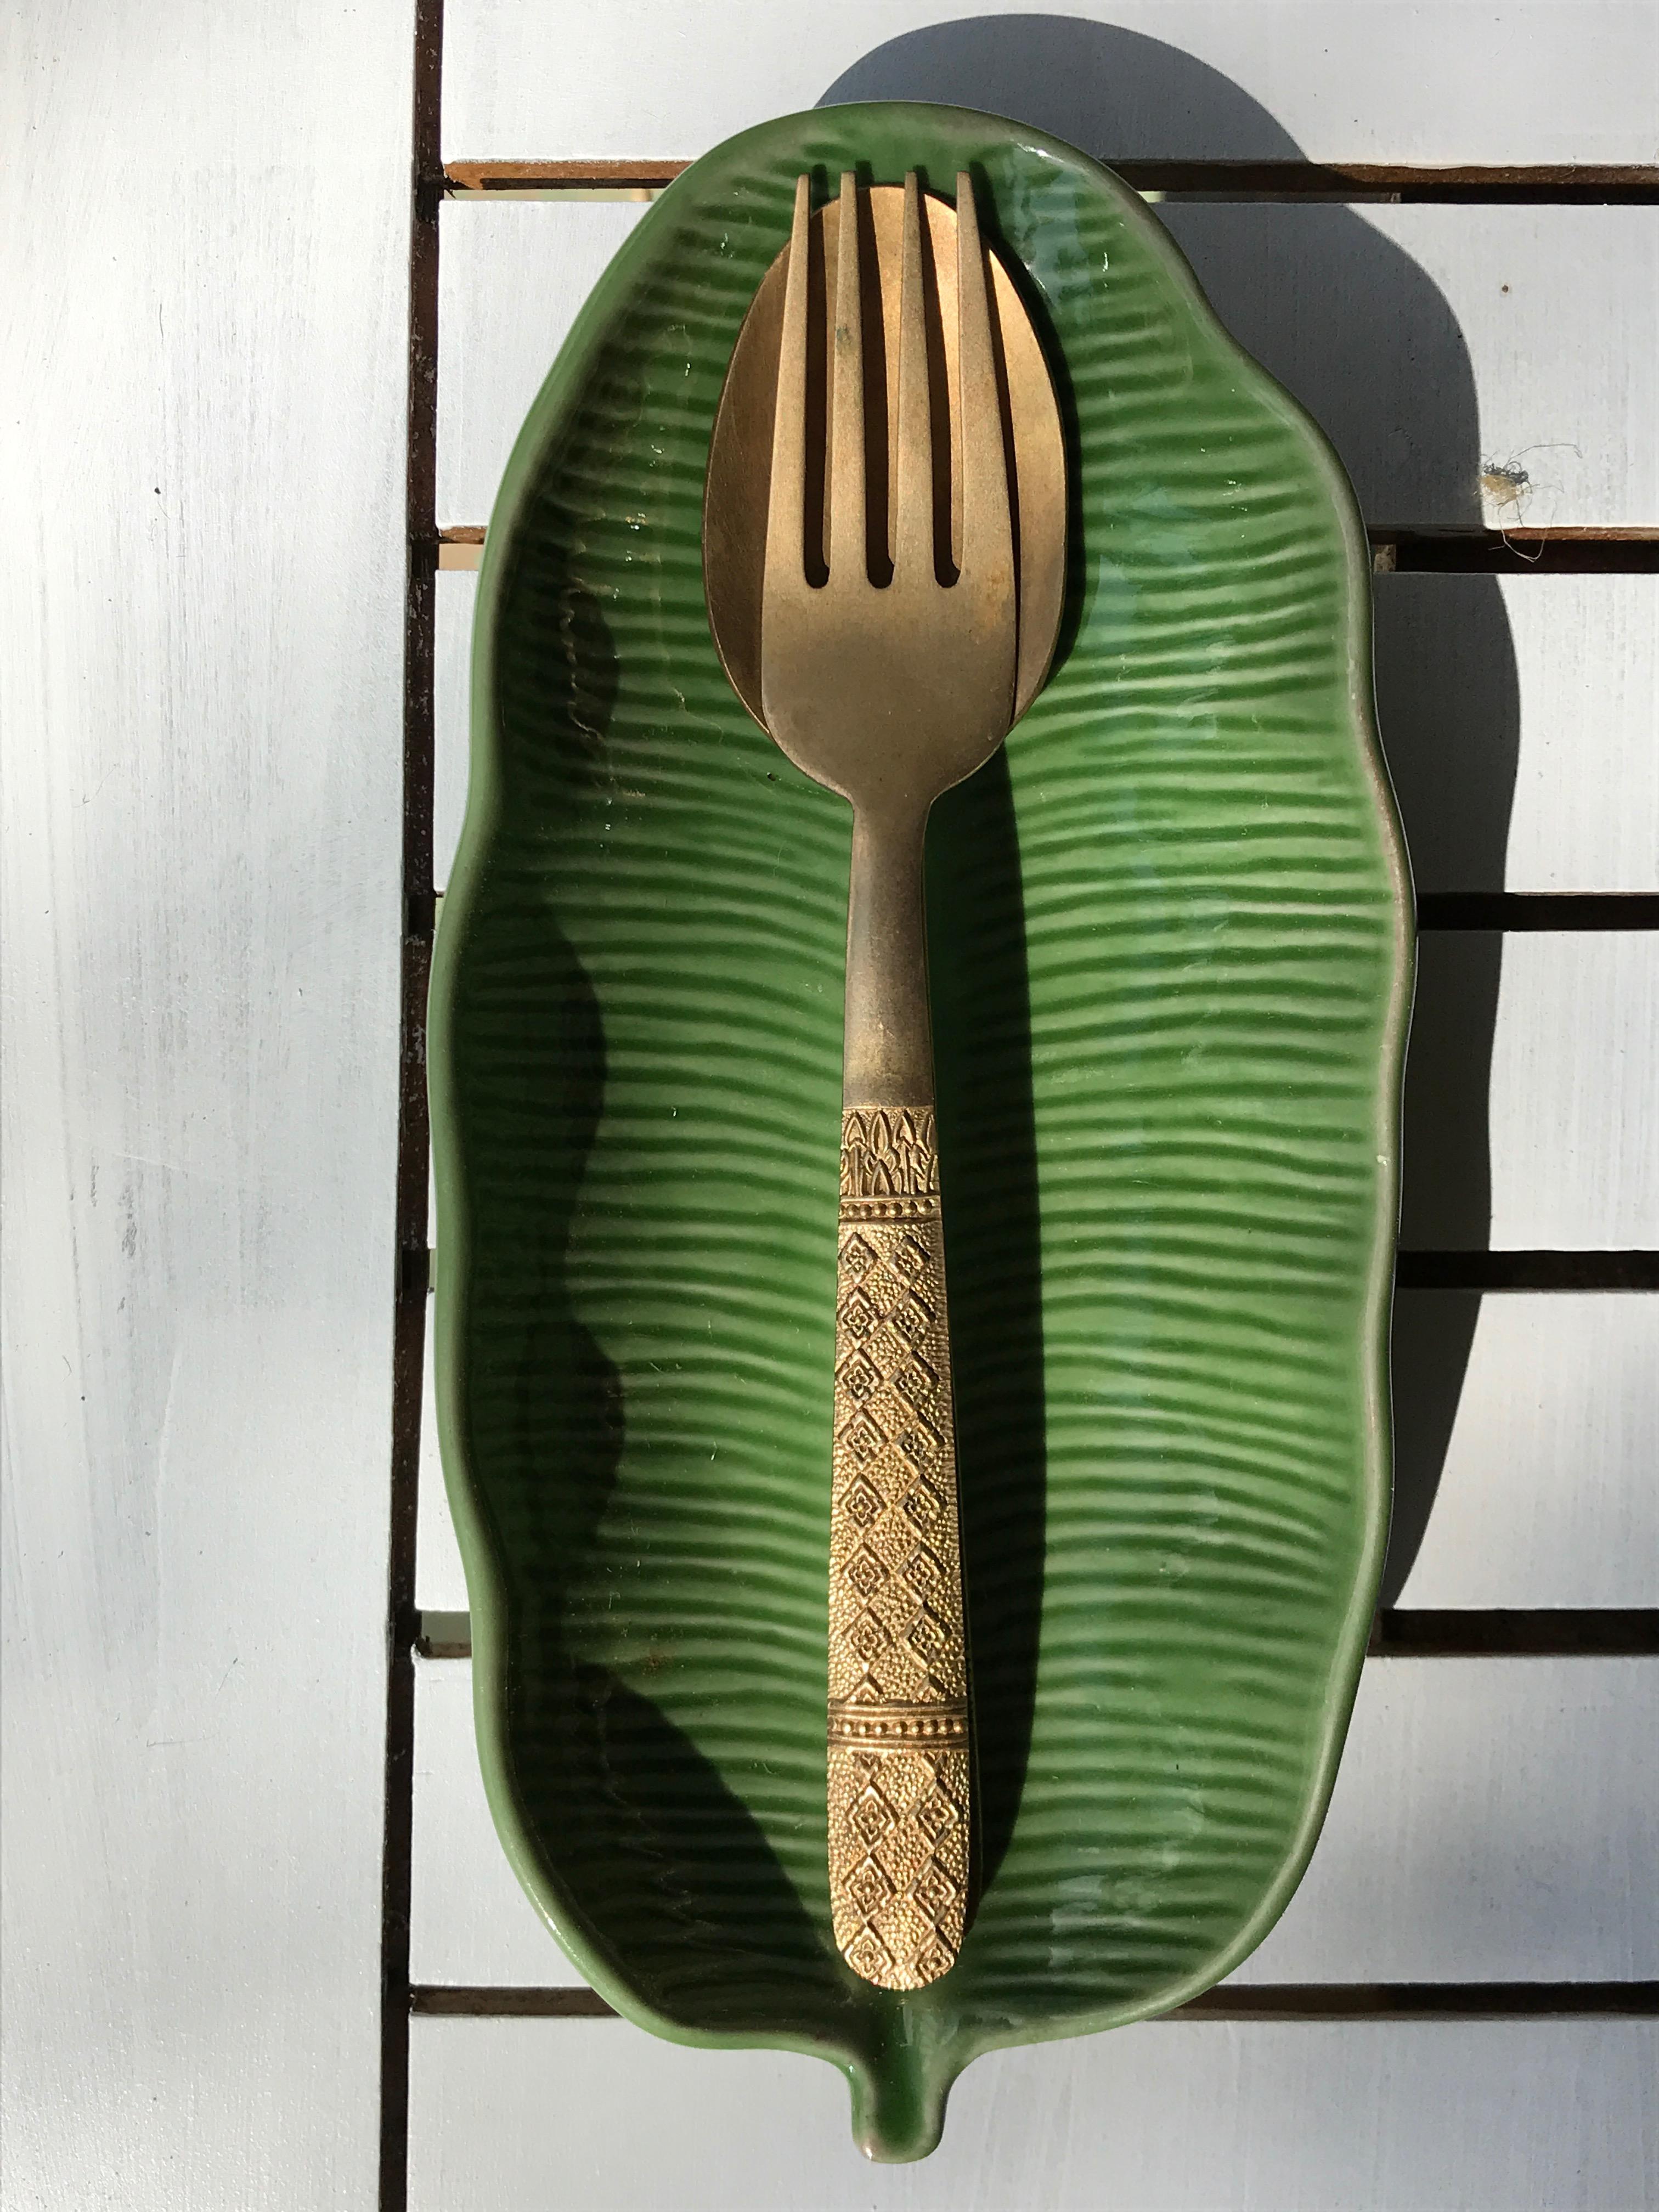 Cutlery & plate